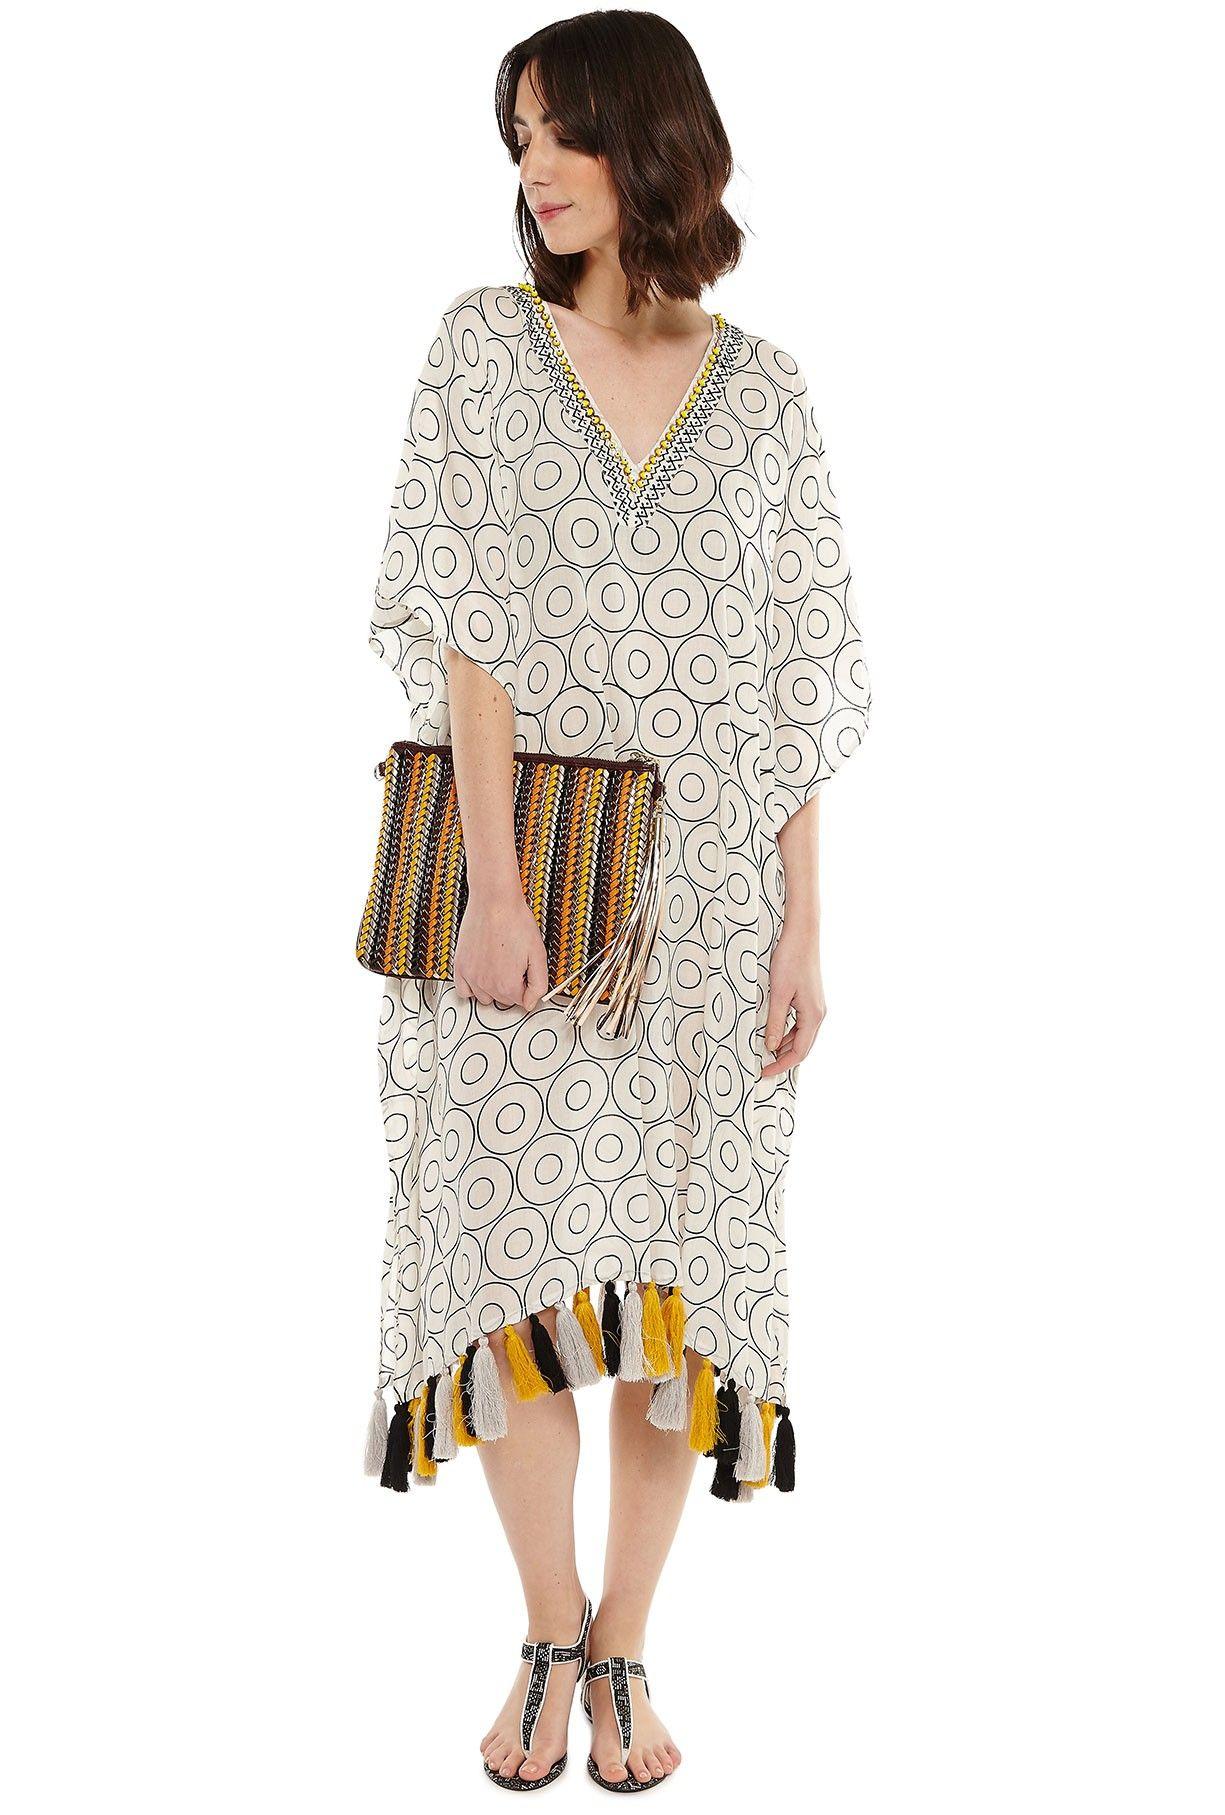 Laterfall dress > 10 Key Pieces